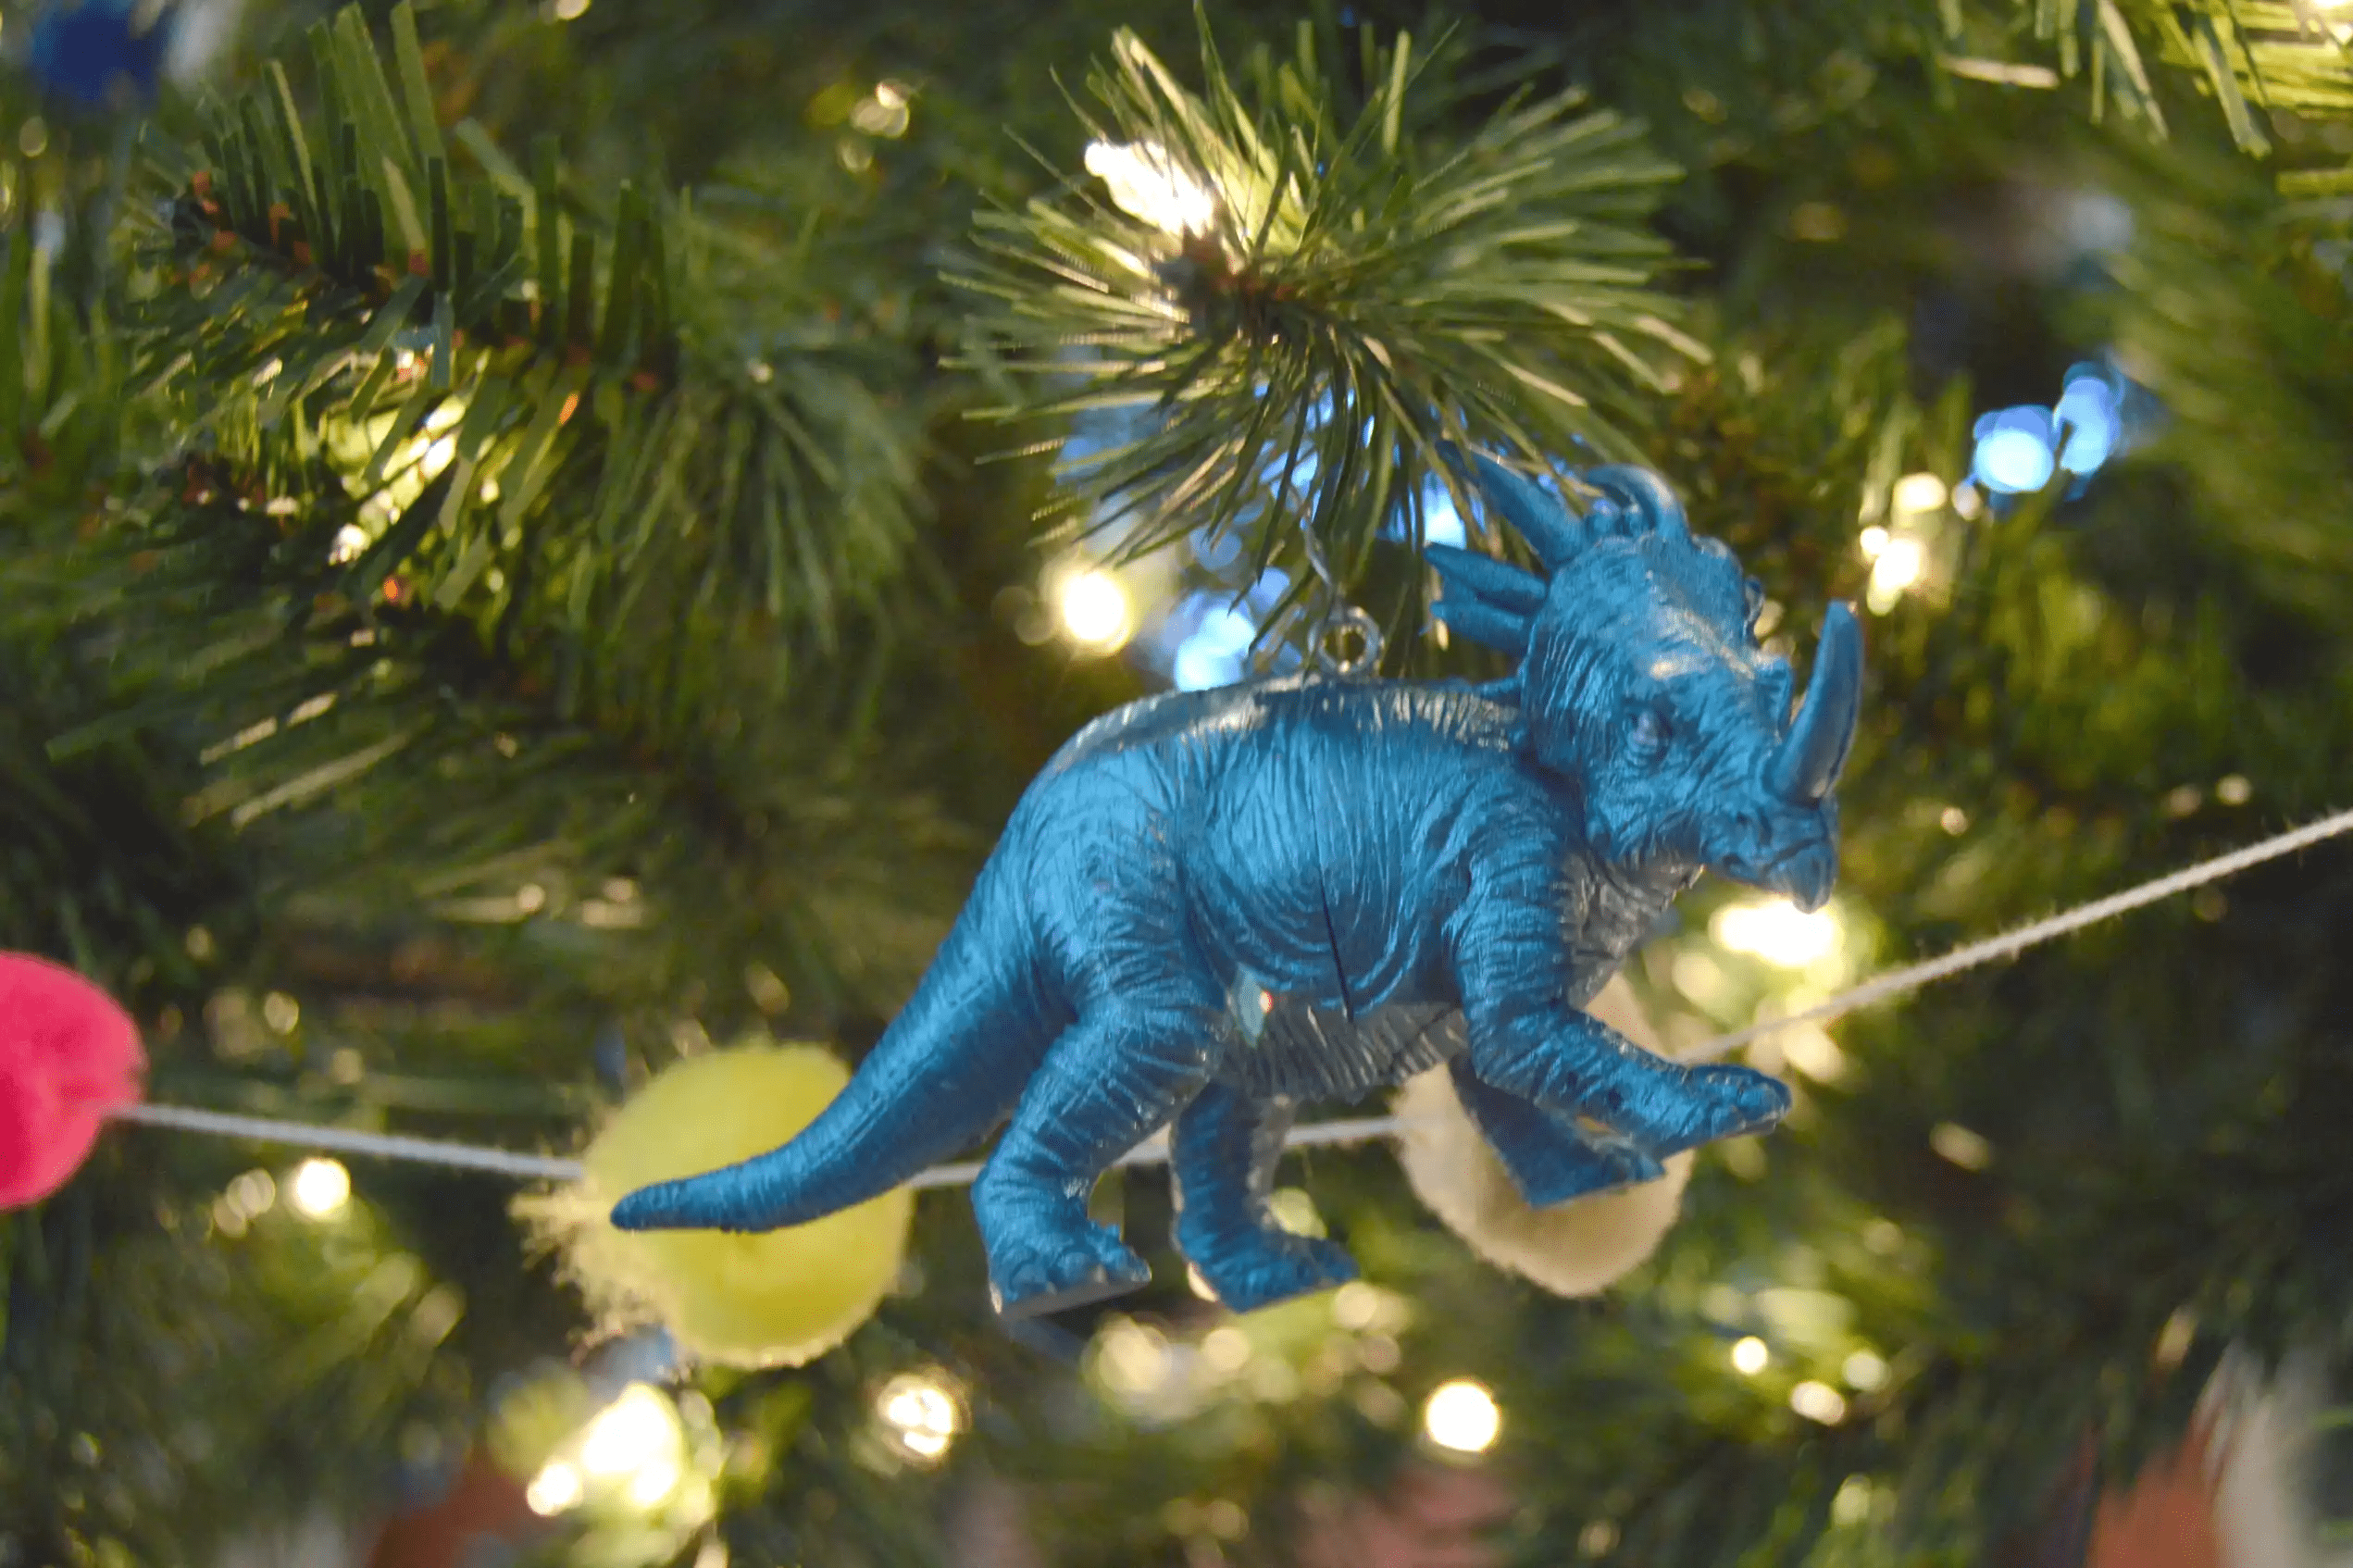 Arbre de Noël avec ornement de dinosaure bleu